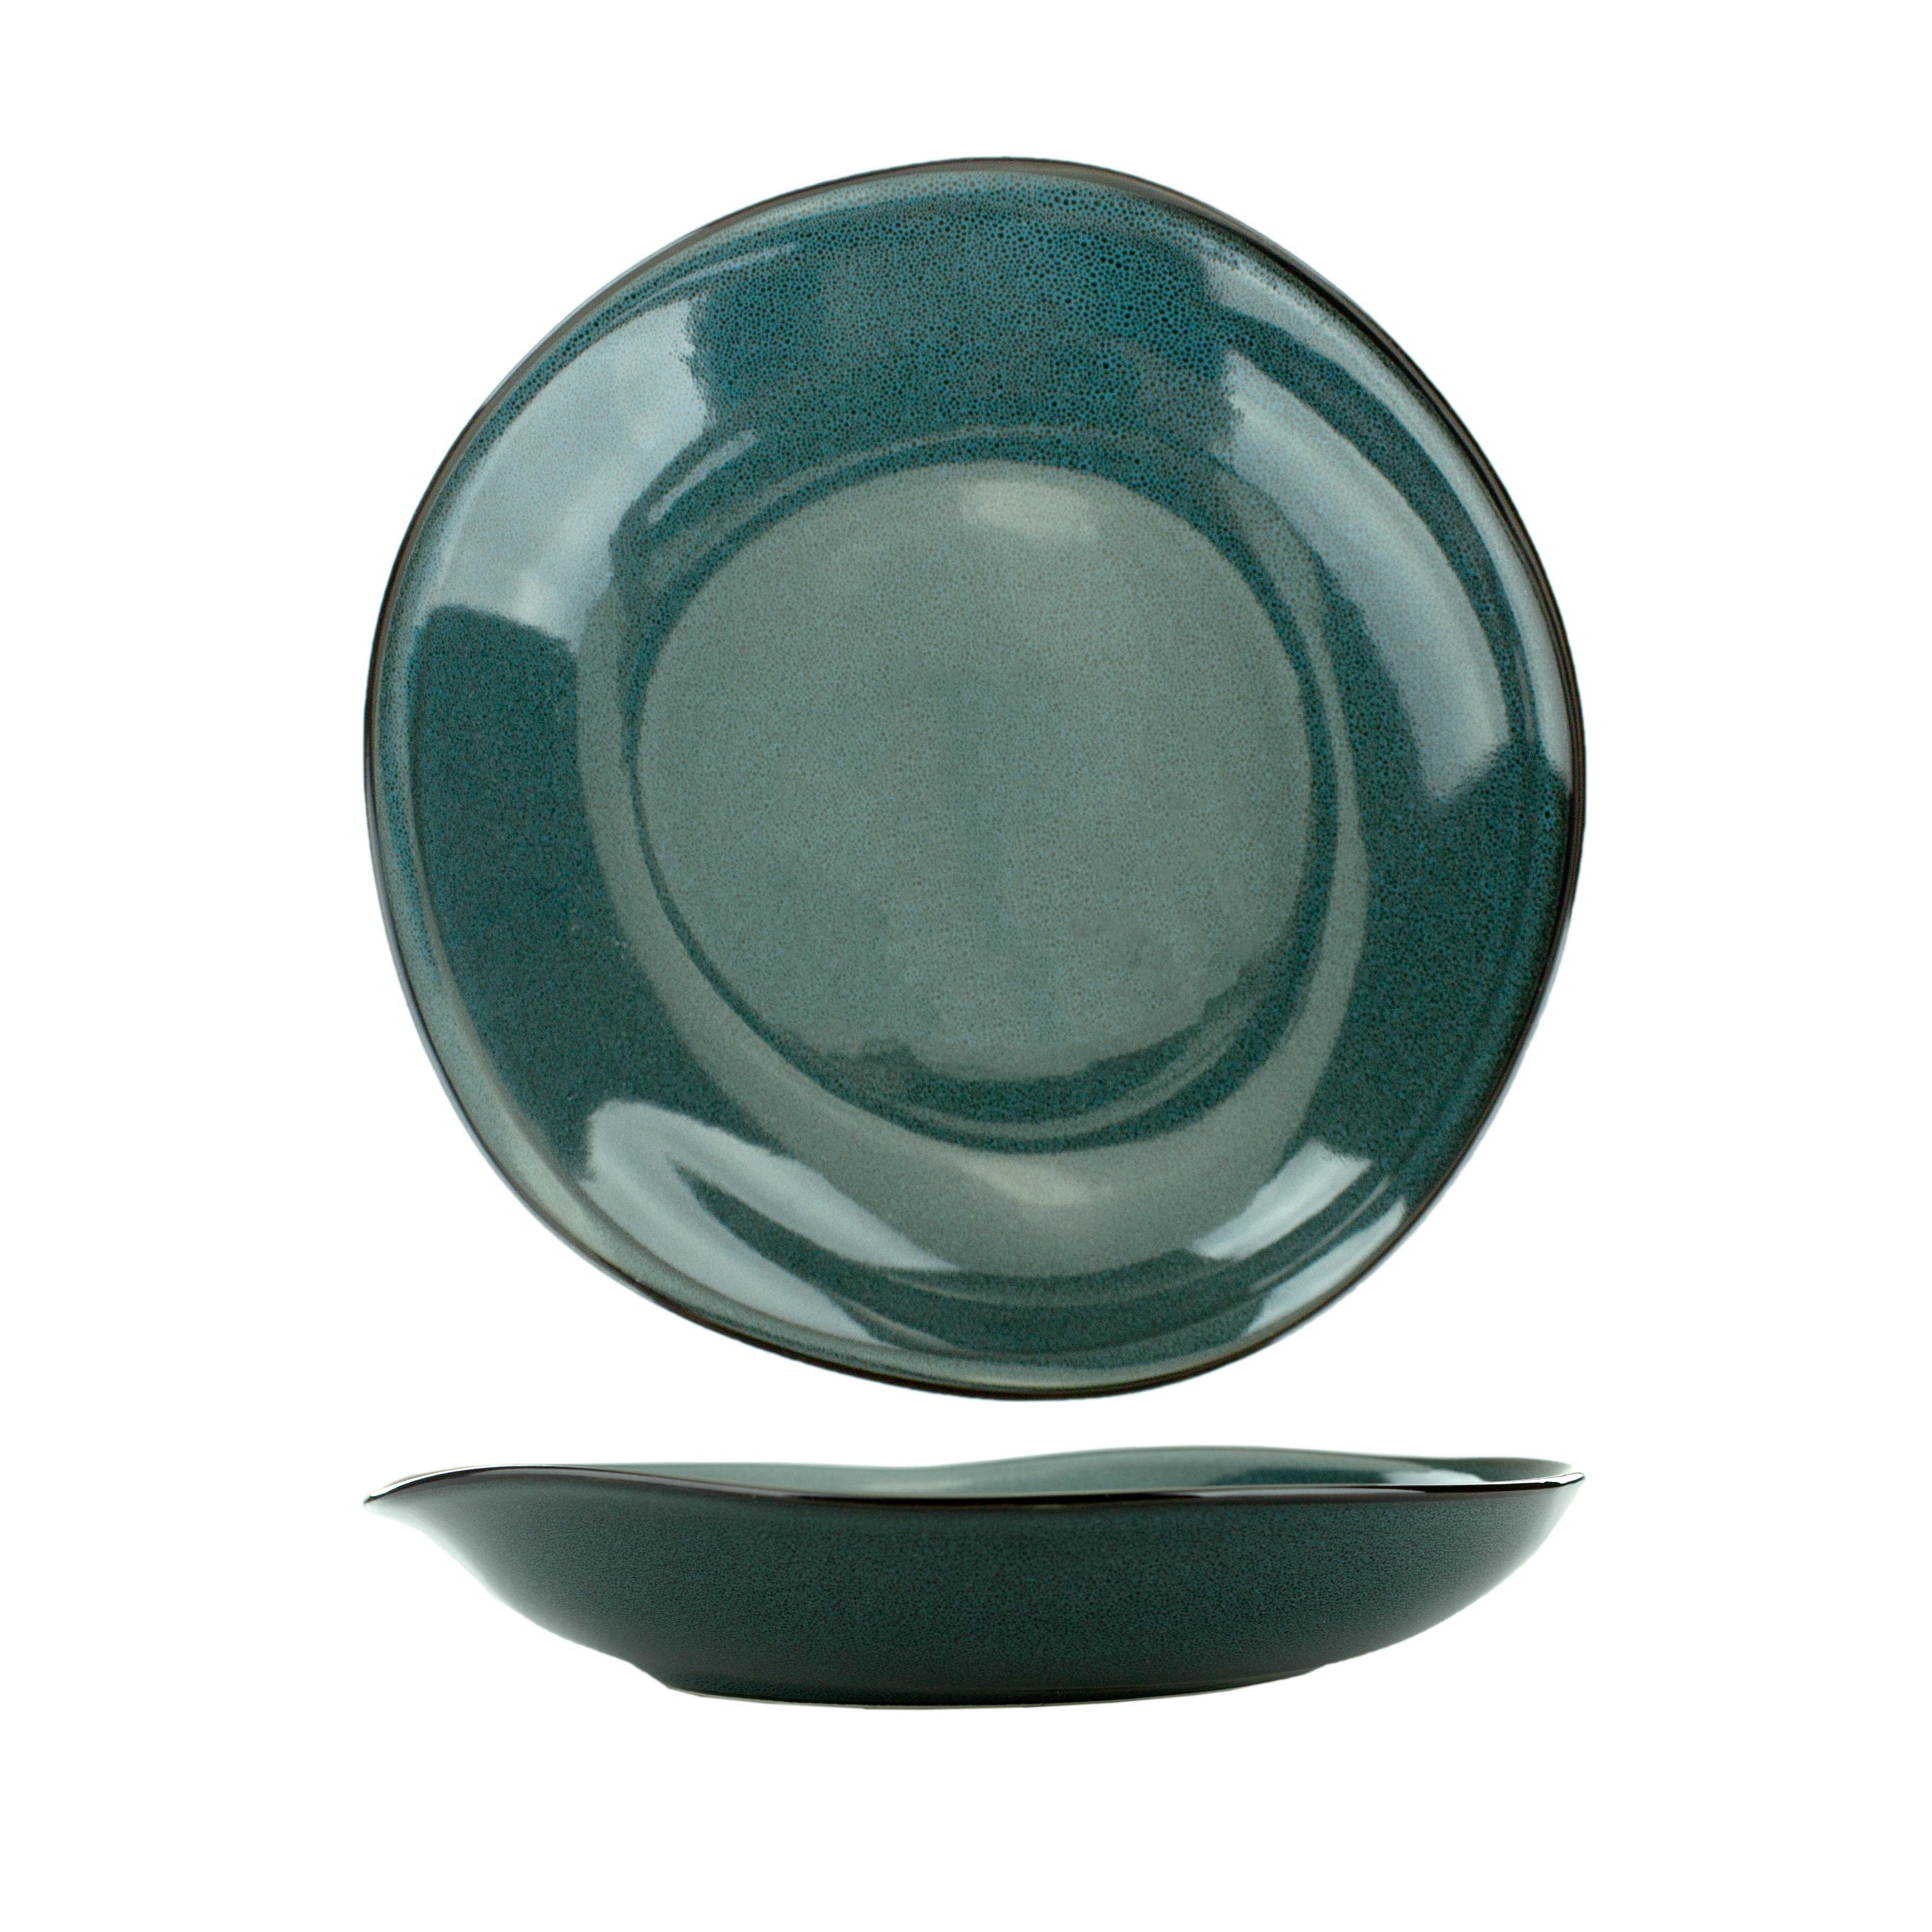 International Tableware LU-3-MI china, bowl, 17 - 32 oz